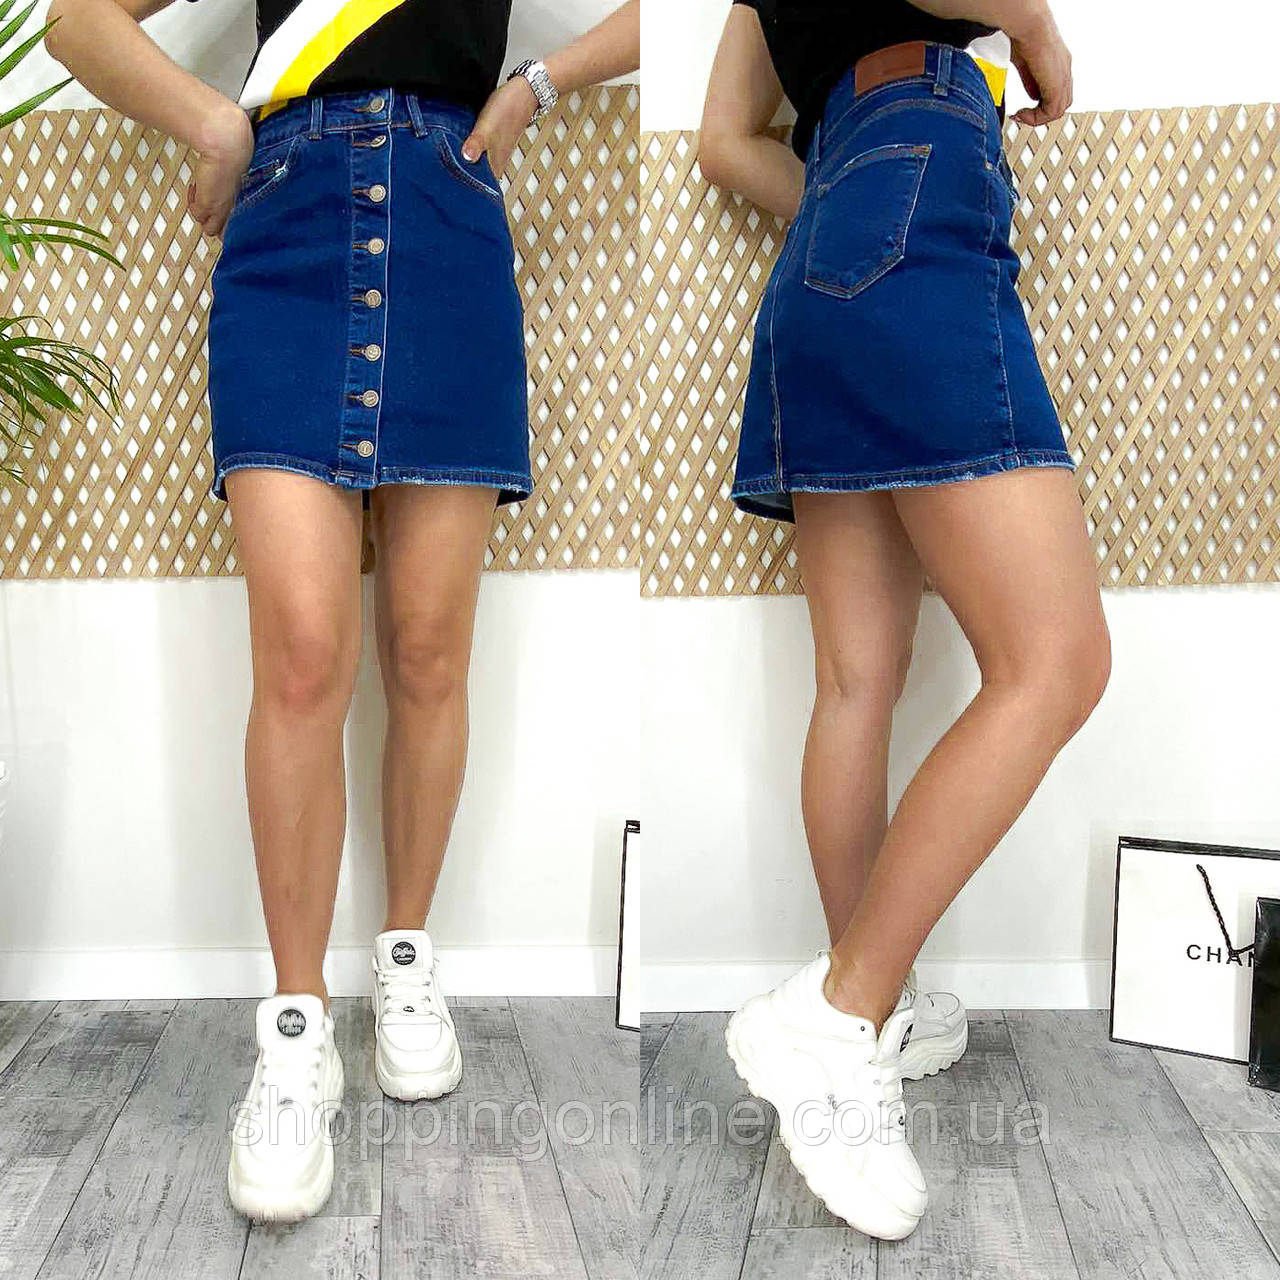 0590-12 Arox юбка джинсовая на пуговицах весенняя стрейчевая (36,38,40, 3 ед.)